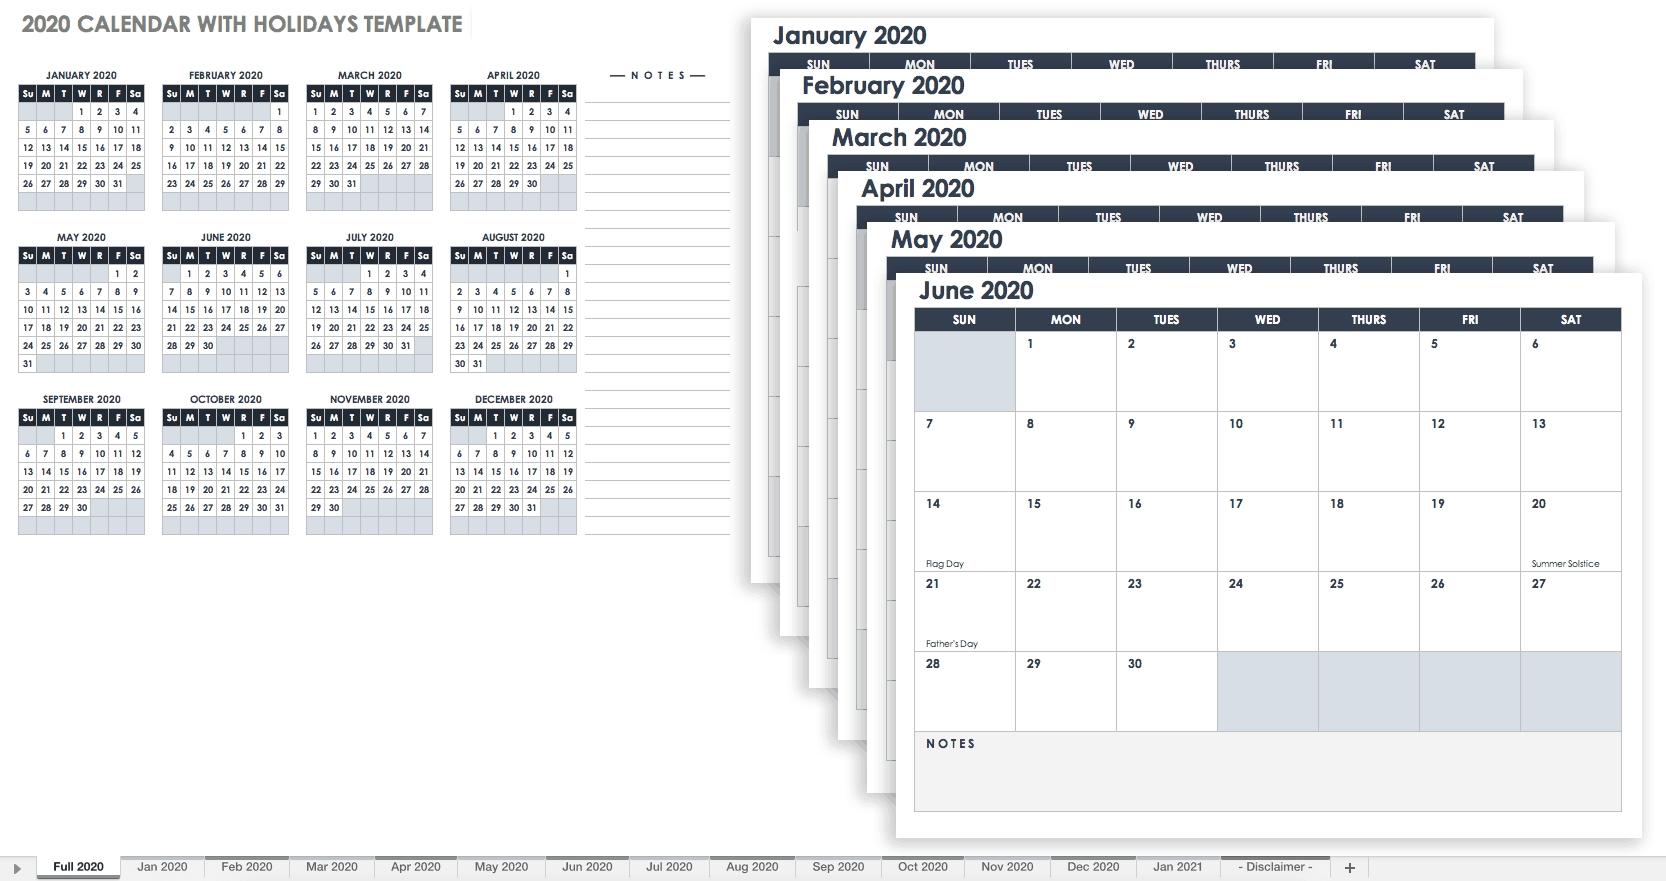 Free Google Calendar Templates | Smartsheet-Google Sheets Calendar Template 2020